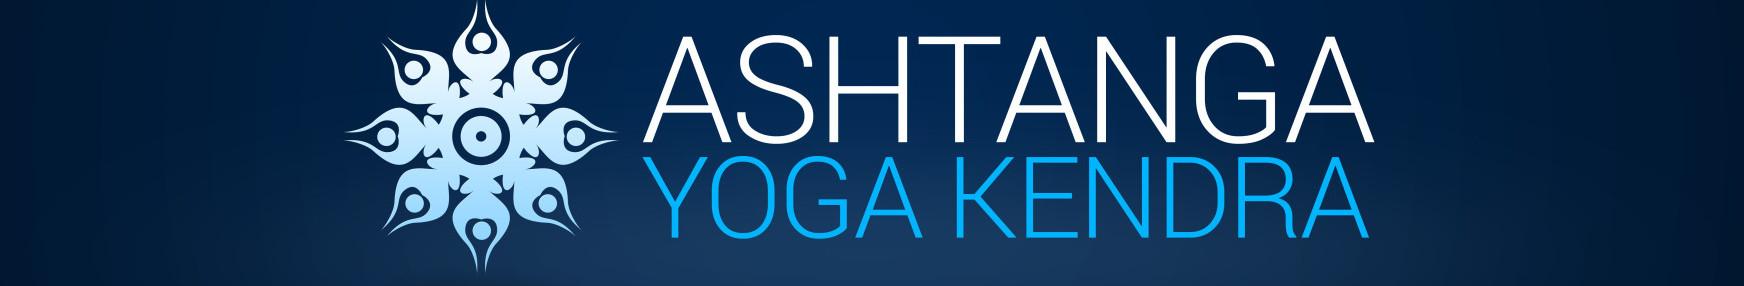 cropped-cropped-Ashtanga-Yoga-Kendra-Hording.jpg